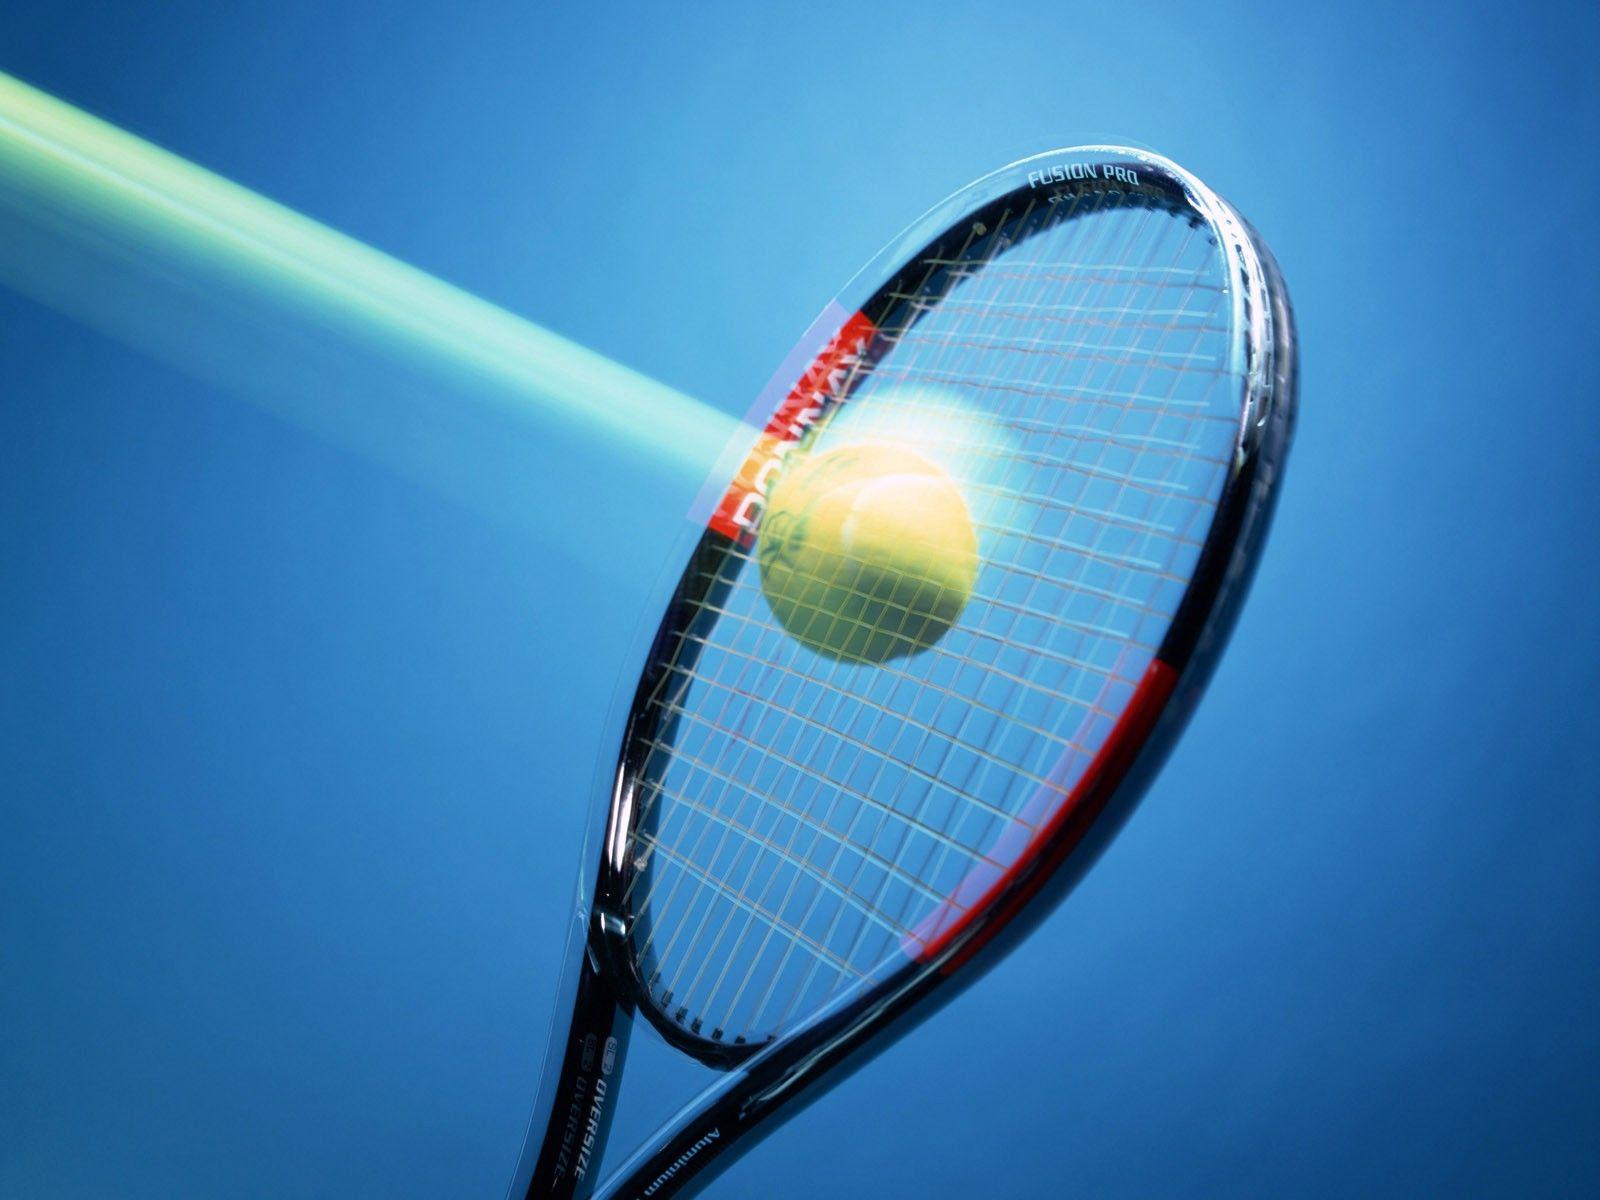 Tennis Hd Wallpapers And Backgrounds Tennis Wallpaper Tennis Tennis Live